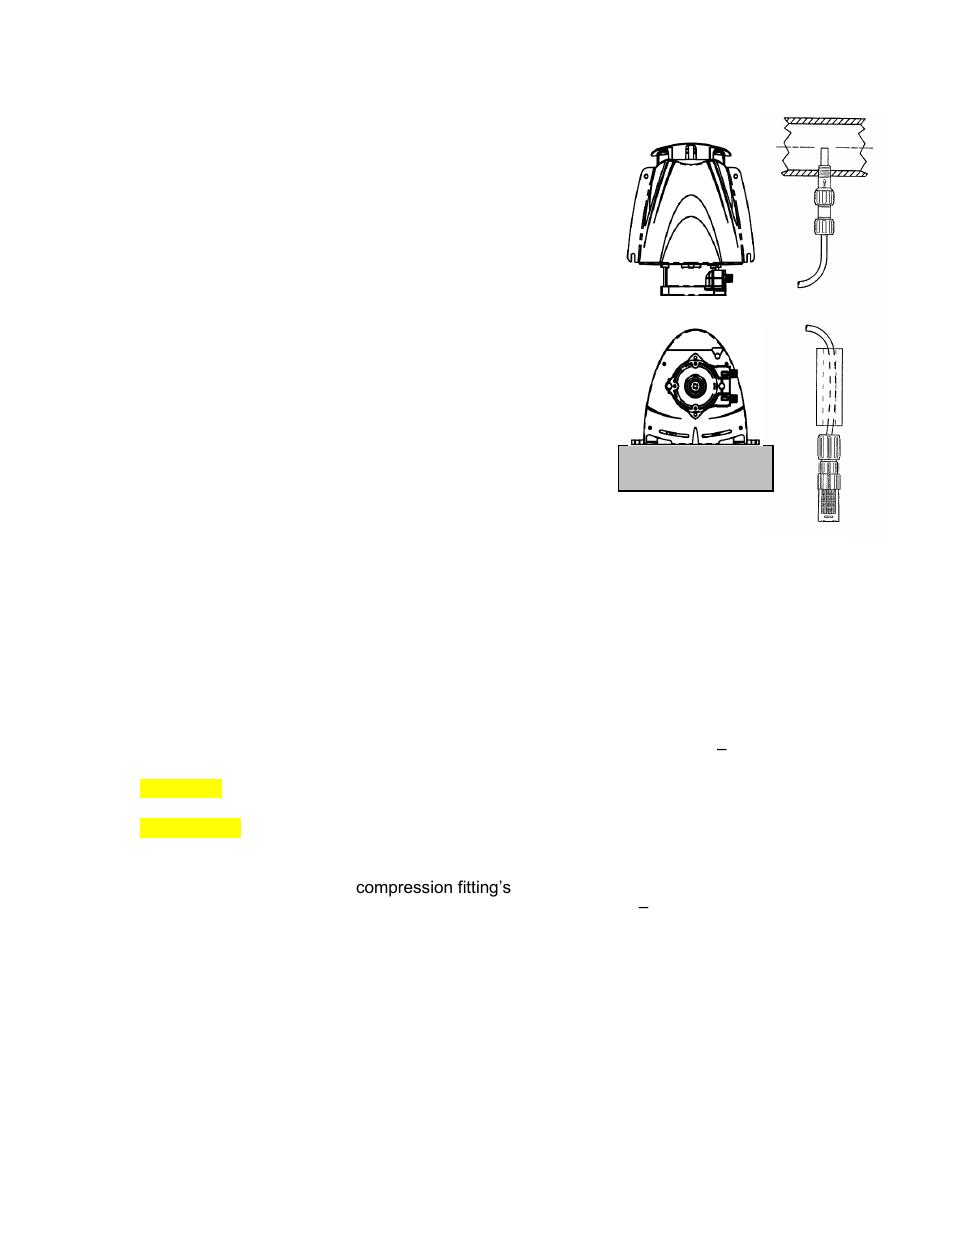 Installation | Pulsafeeder Chem-Tech Series XPV EN User Manual